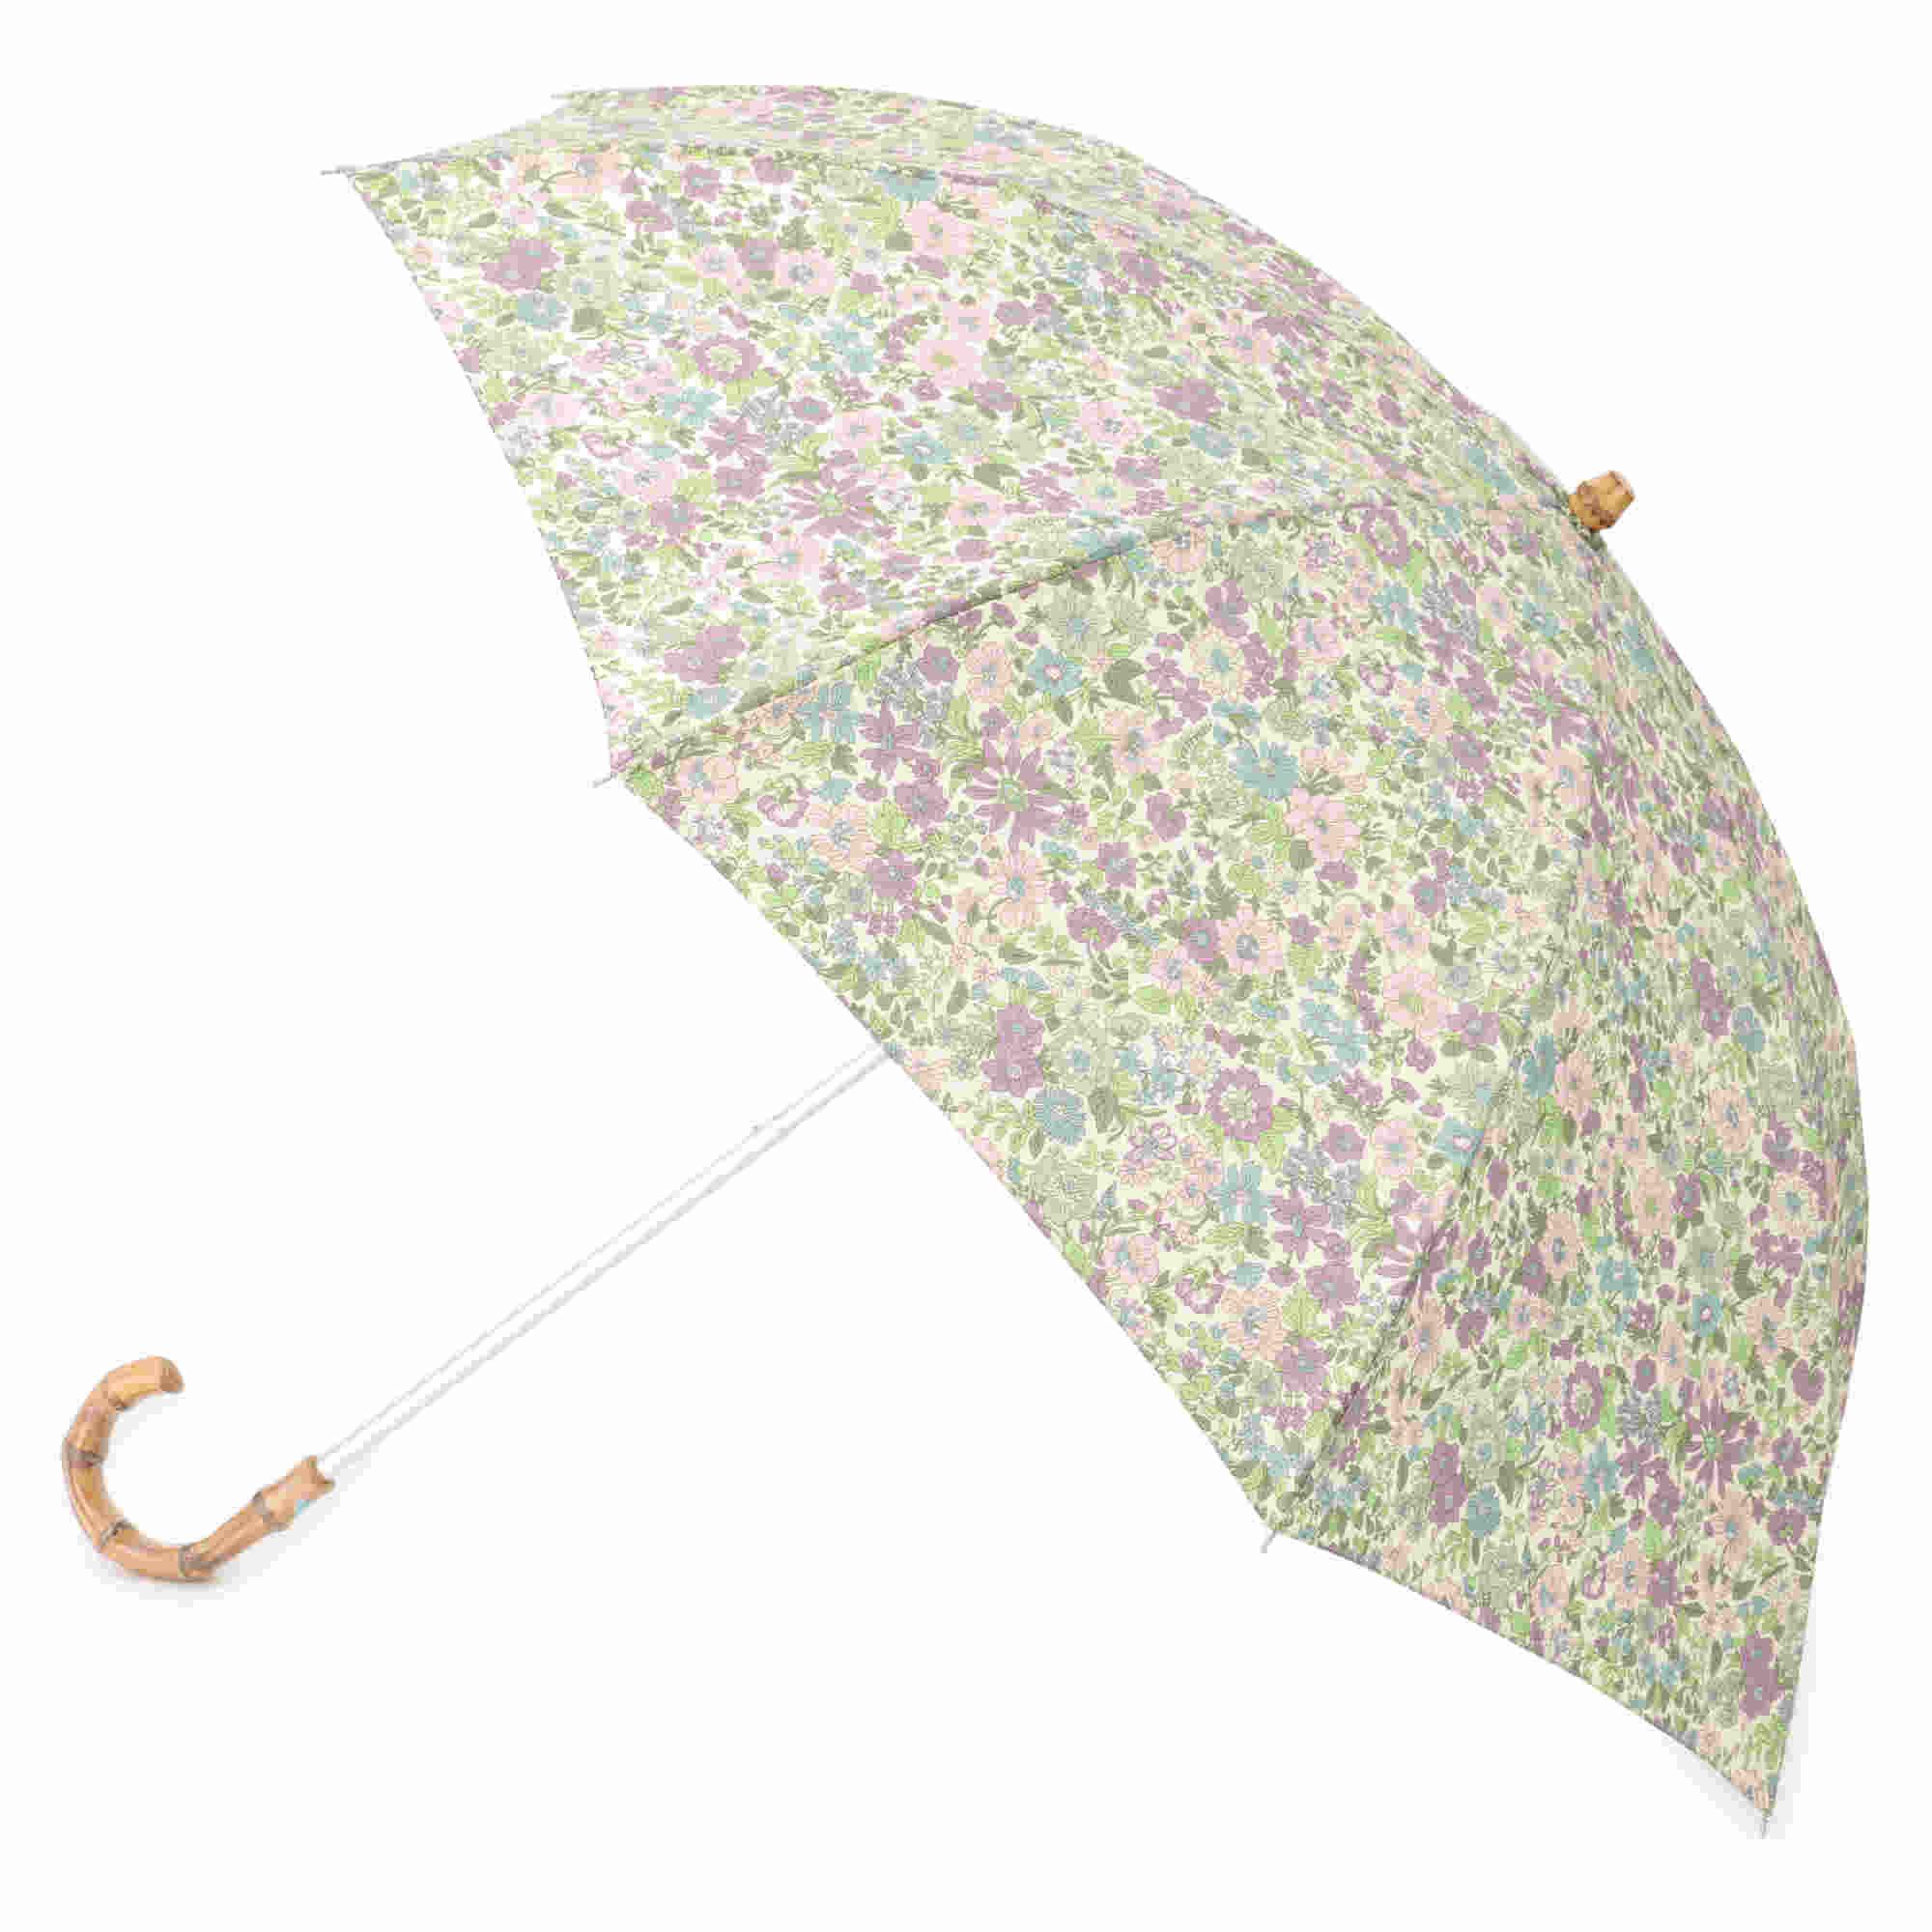 Cou Pole (クーポール) リバティ折りたたみ日傘